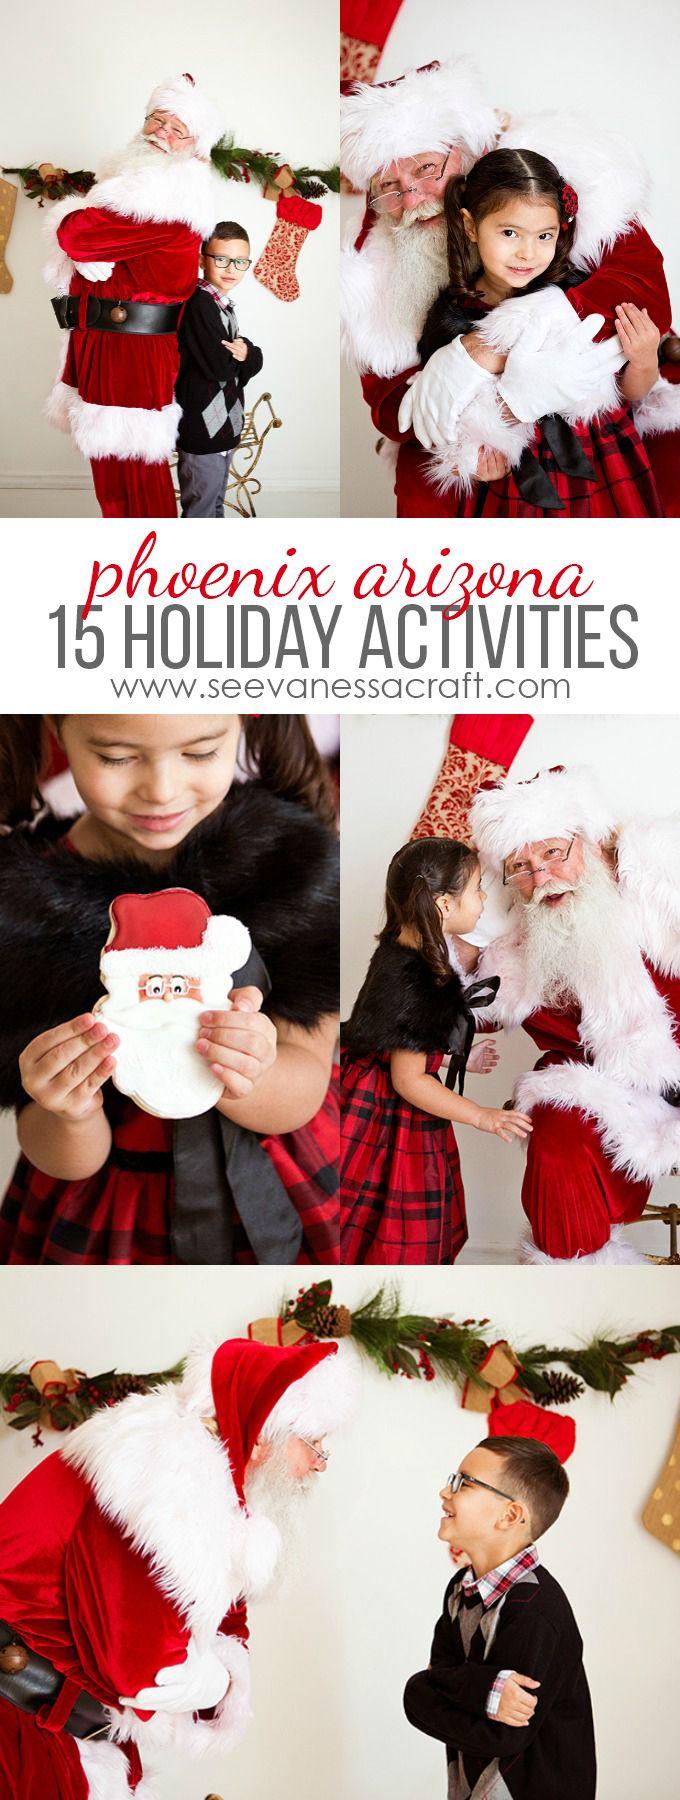 Christmas Activities In Arizona 2020 Things To Do In Phoenix Christmas 2020 | Aubkex.newchristmas.site